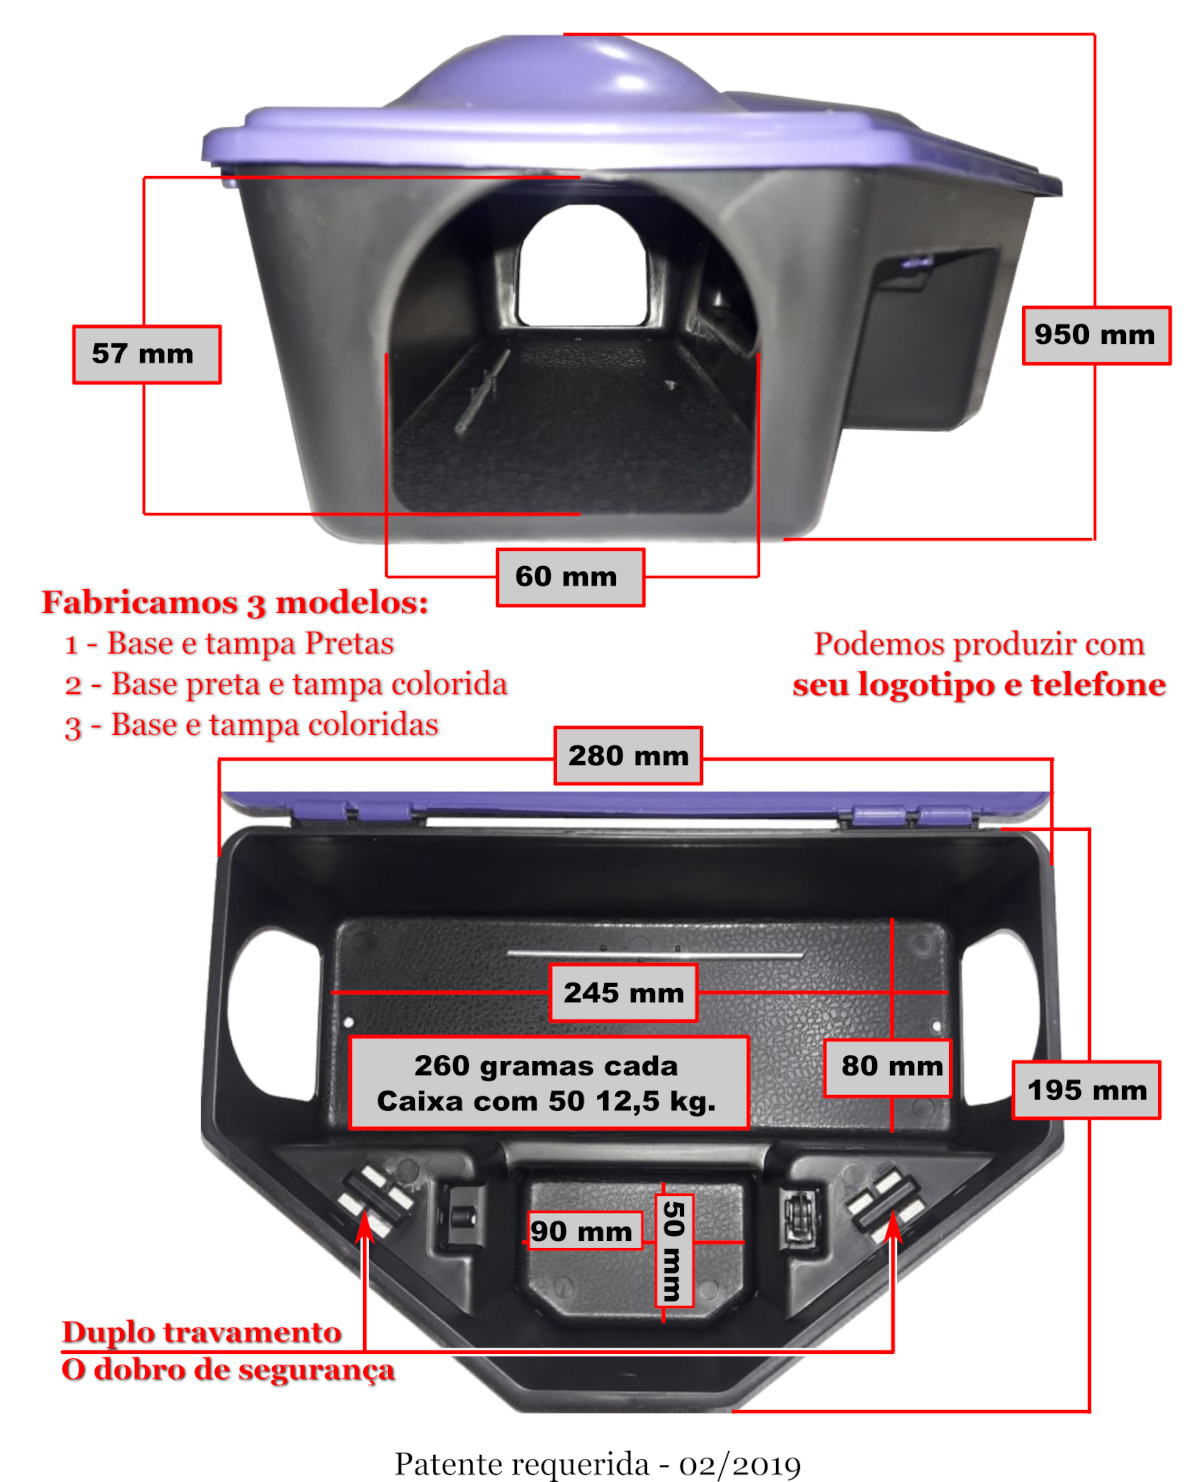 KIT 40 Porta Iscas Resistentes 2 TRAVAS c/ Chave Mata Ratos